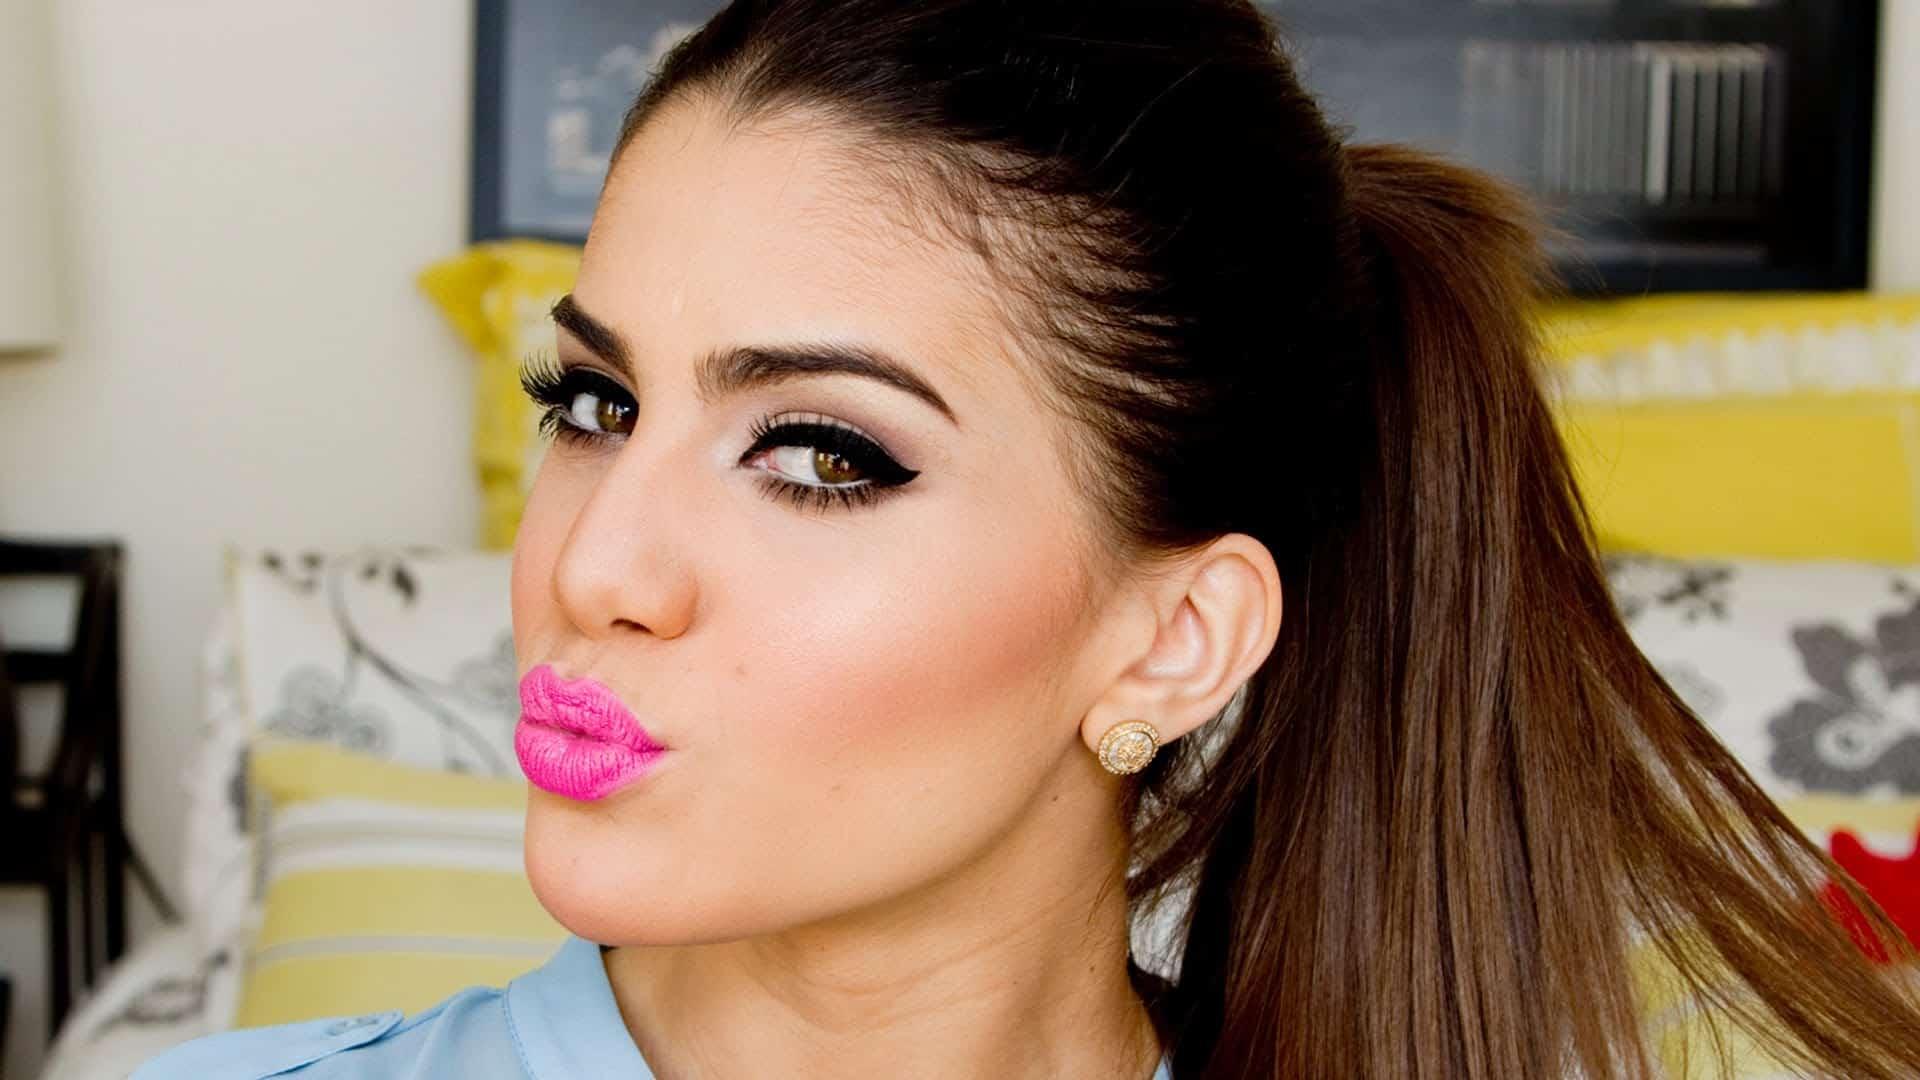 Playful pink lip